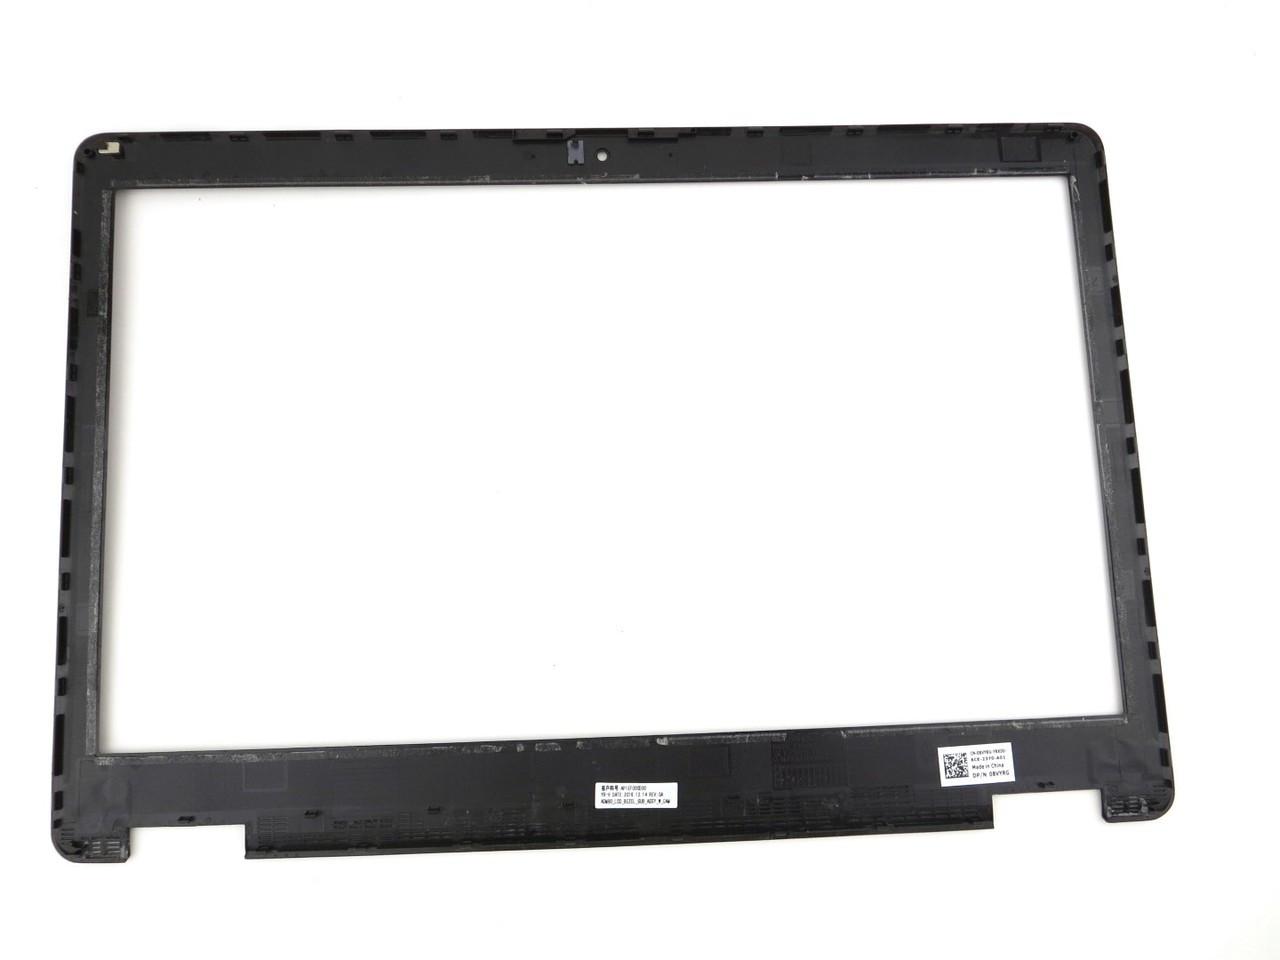 Dell Latitude E5570 / Precision 15 3510 LCD Front Trim Cover Bezel Plastic - With Camera Port - Non Touchscreen - 8VYRG 08VYRG